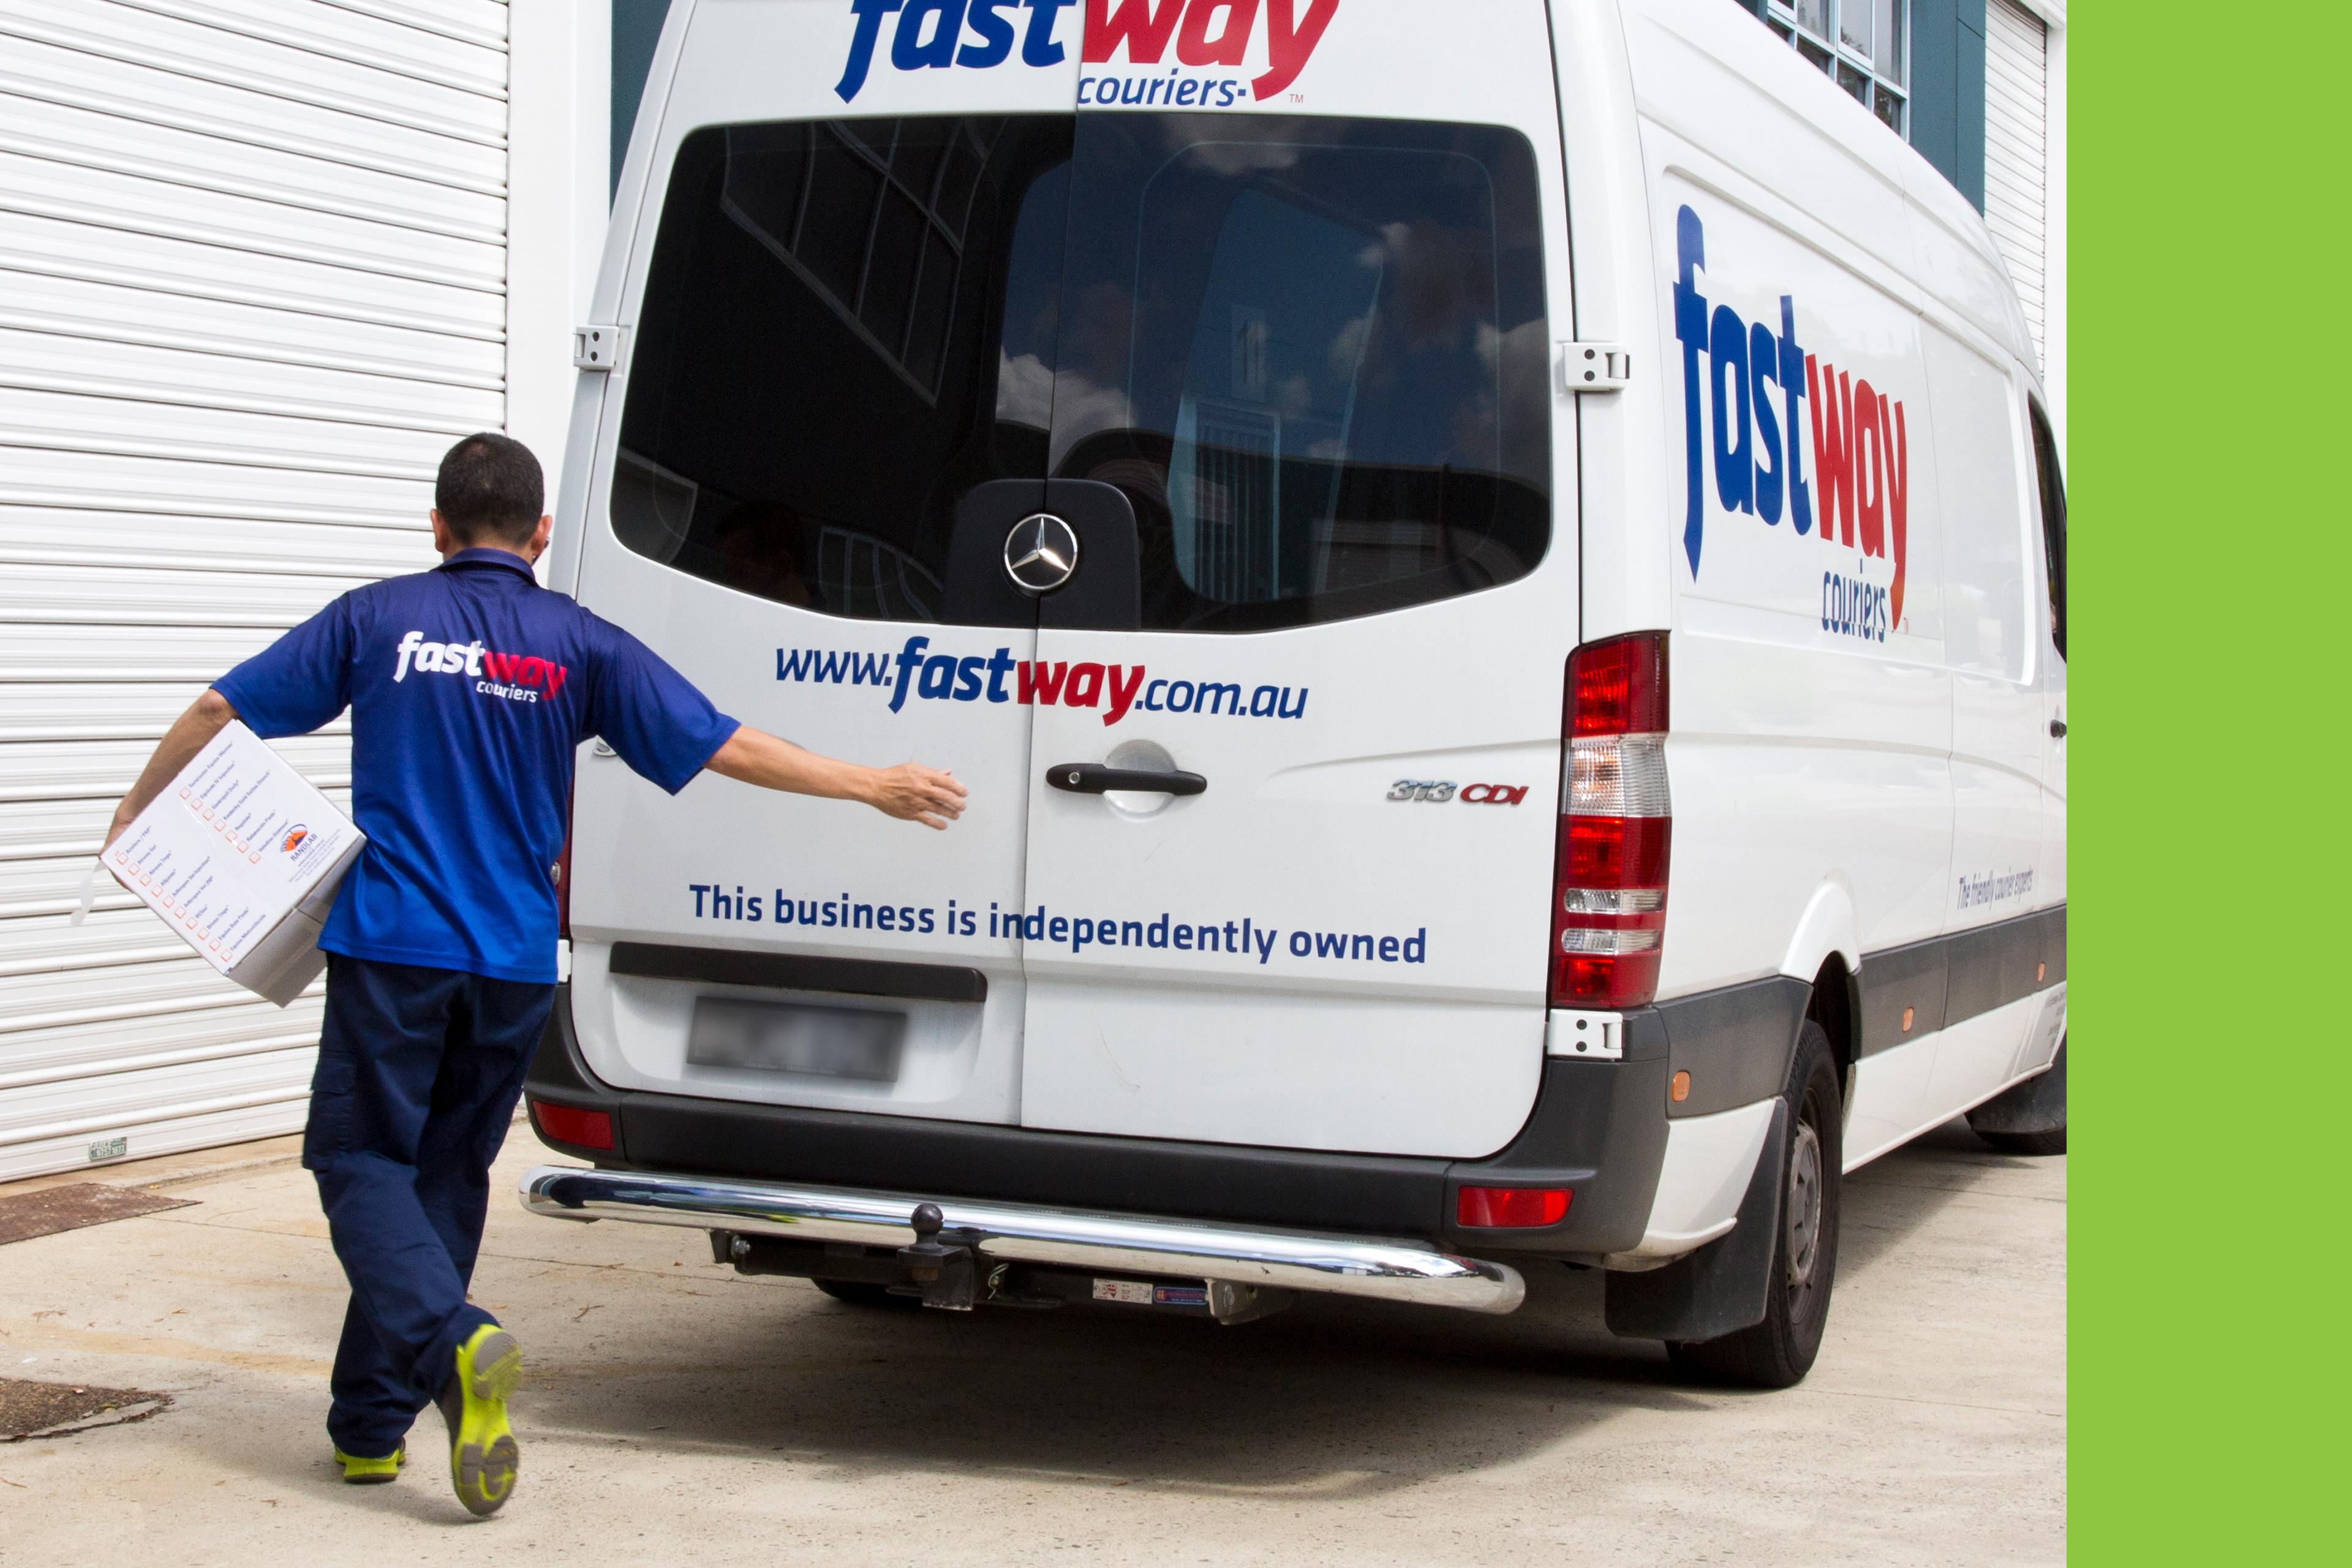 Courier Franchise business in transport/logistics. Brunswick West, Melbourne